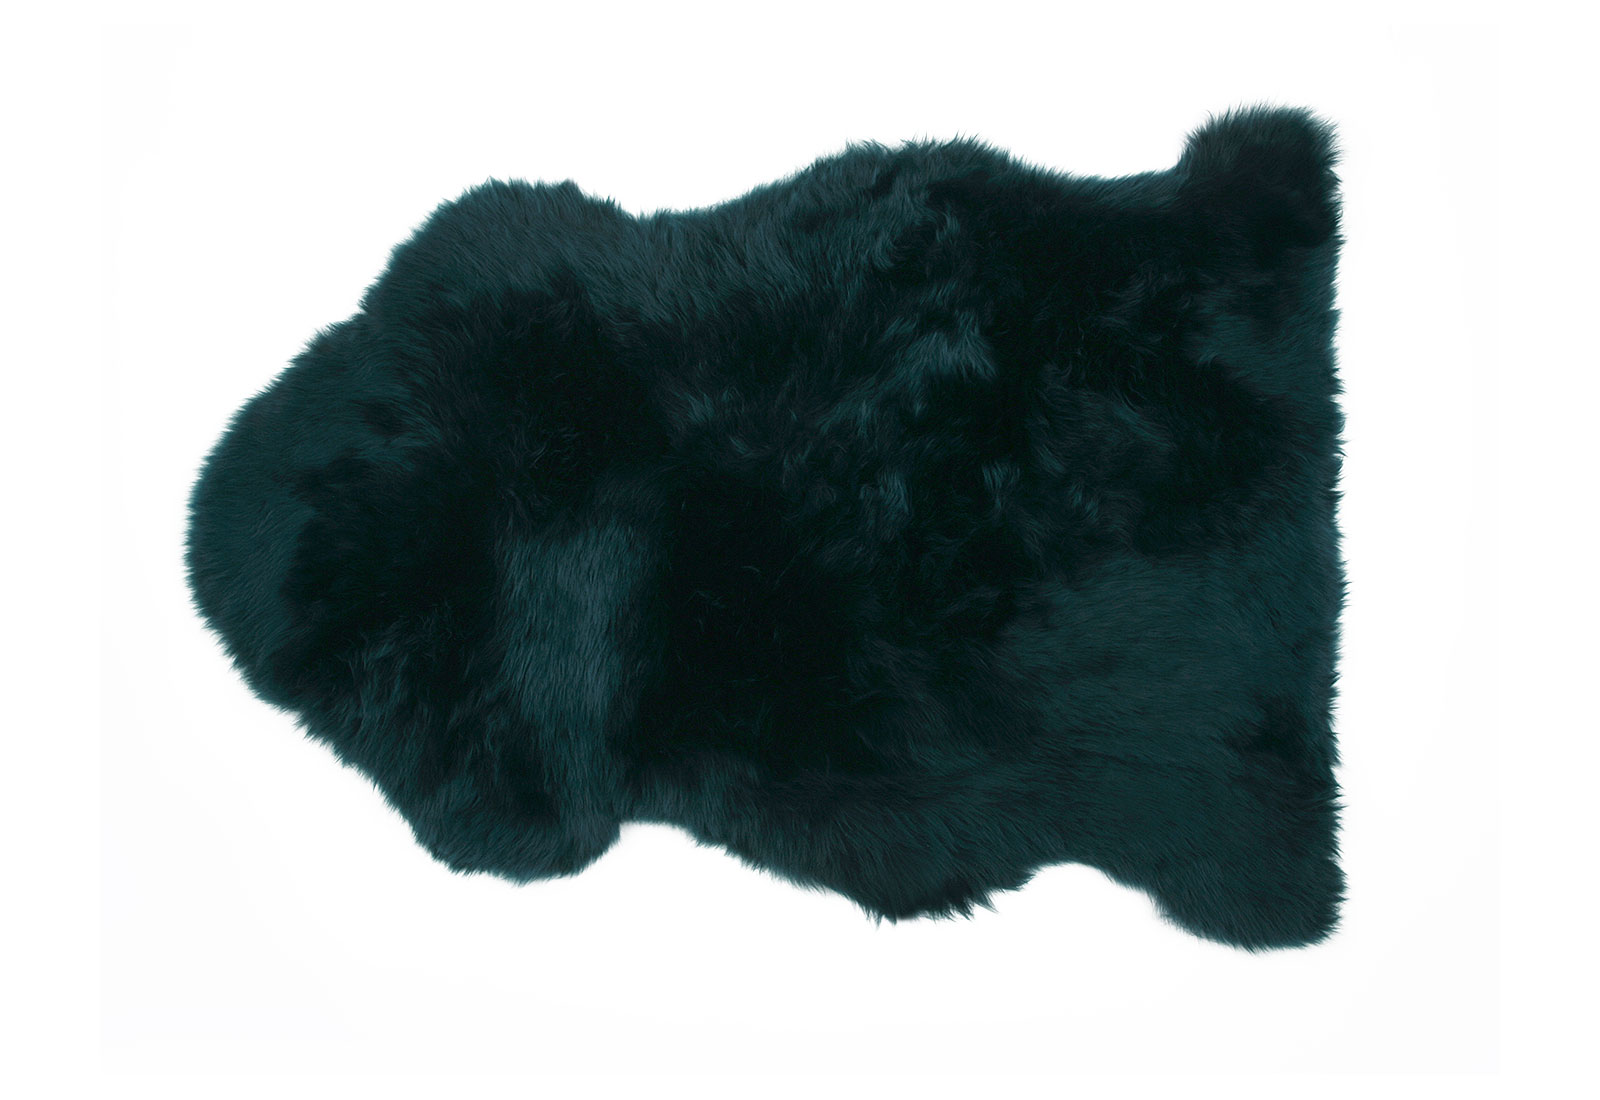 Caspian Sheepskin Rug